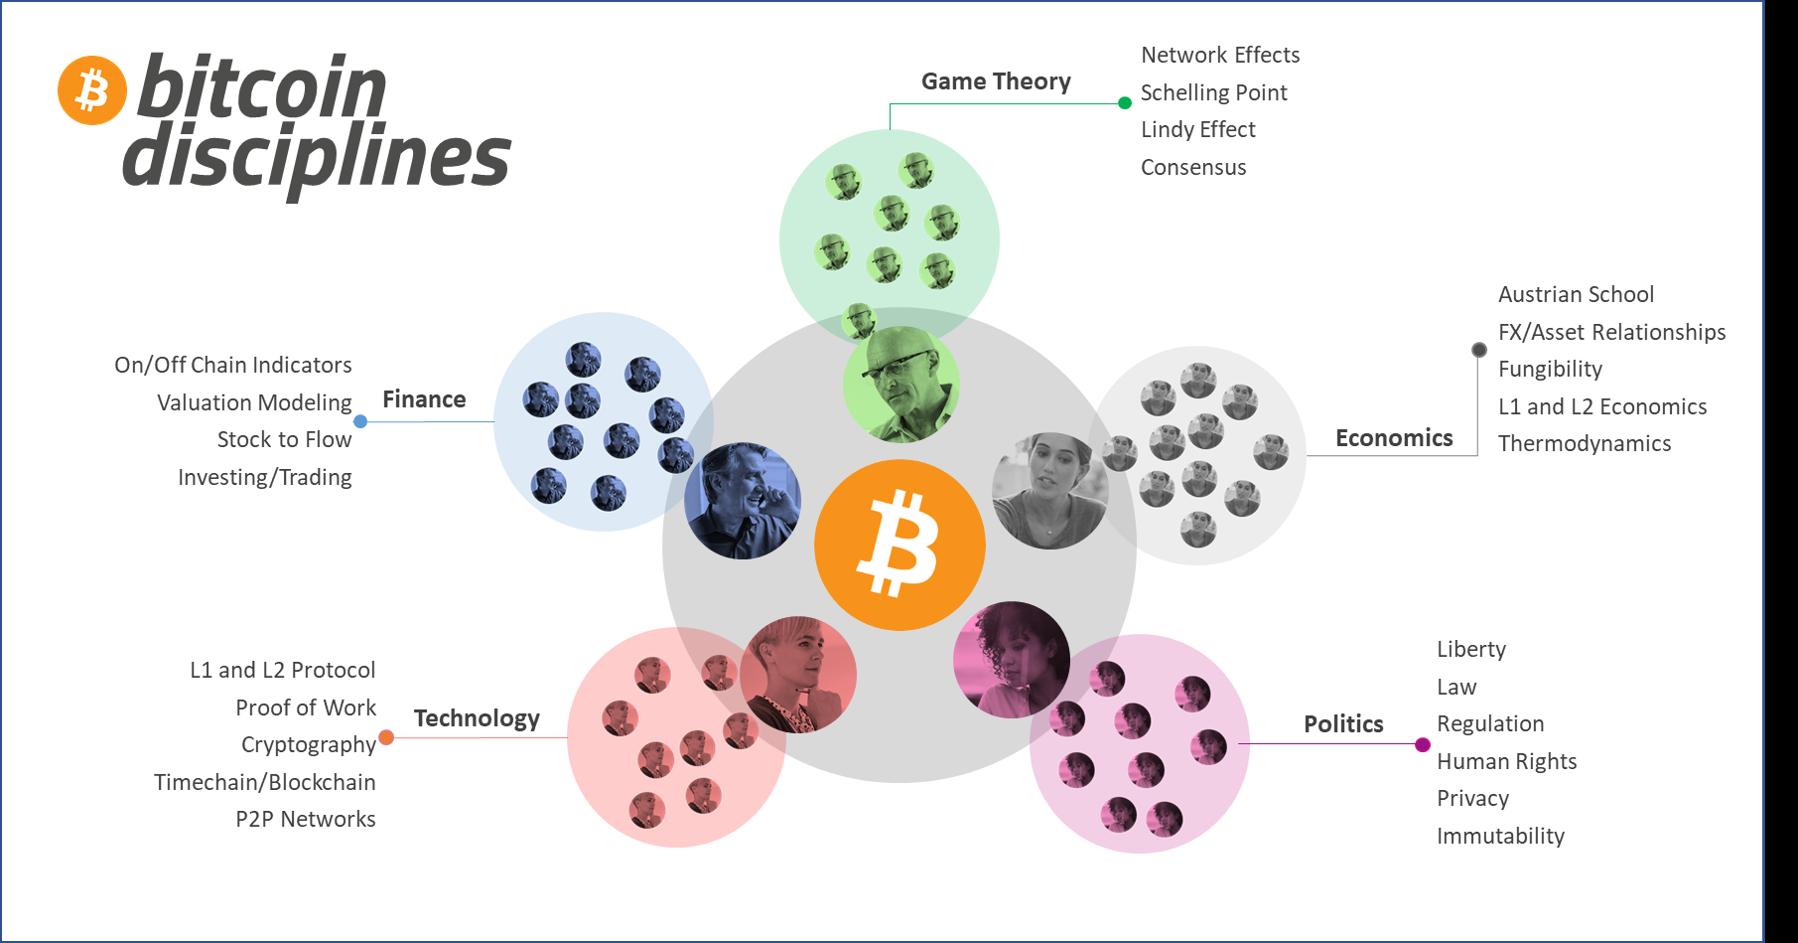 Bitcoin Disciplines